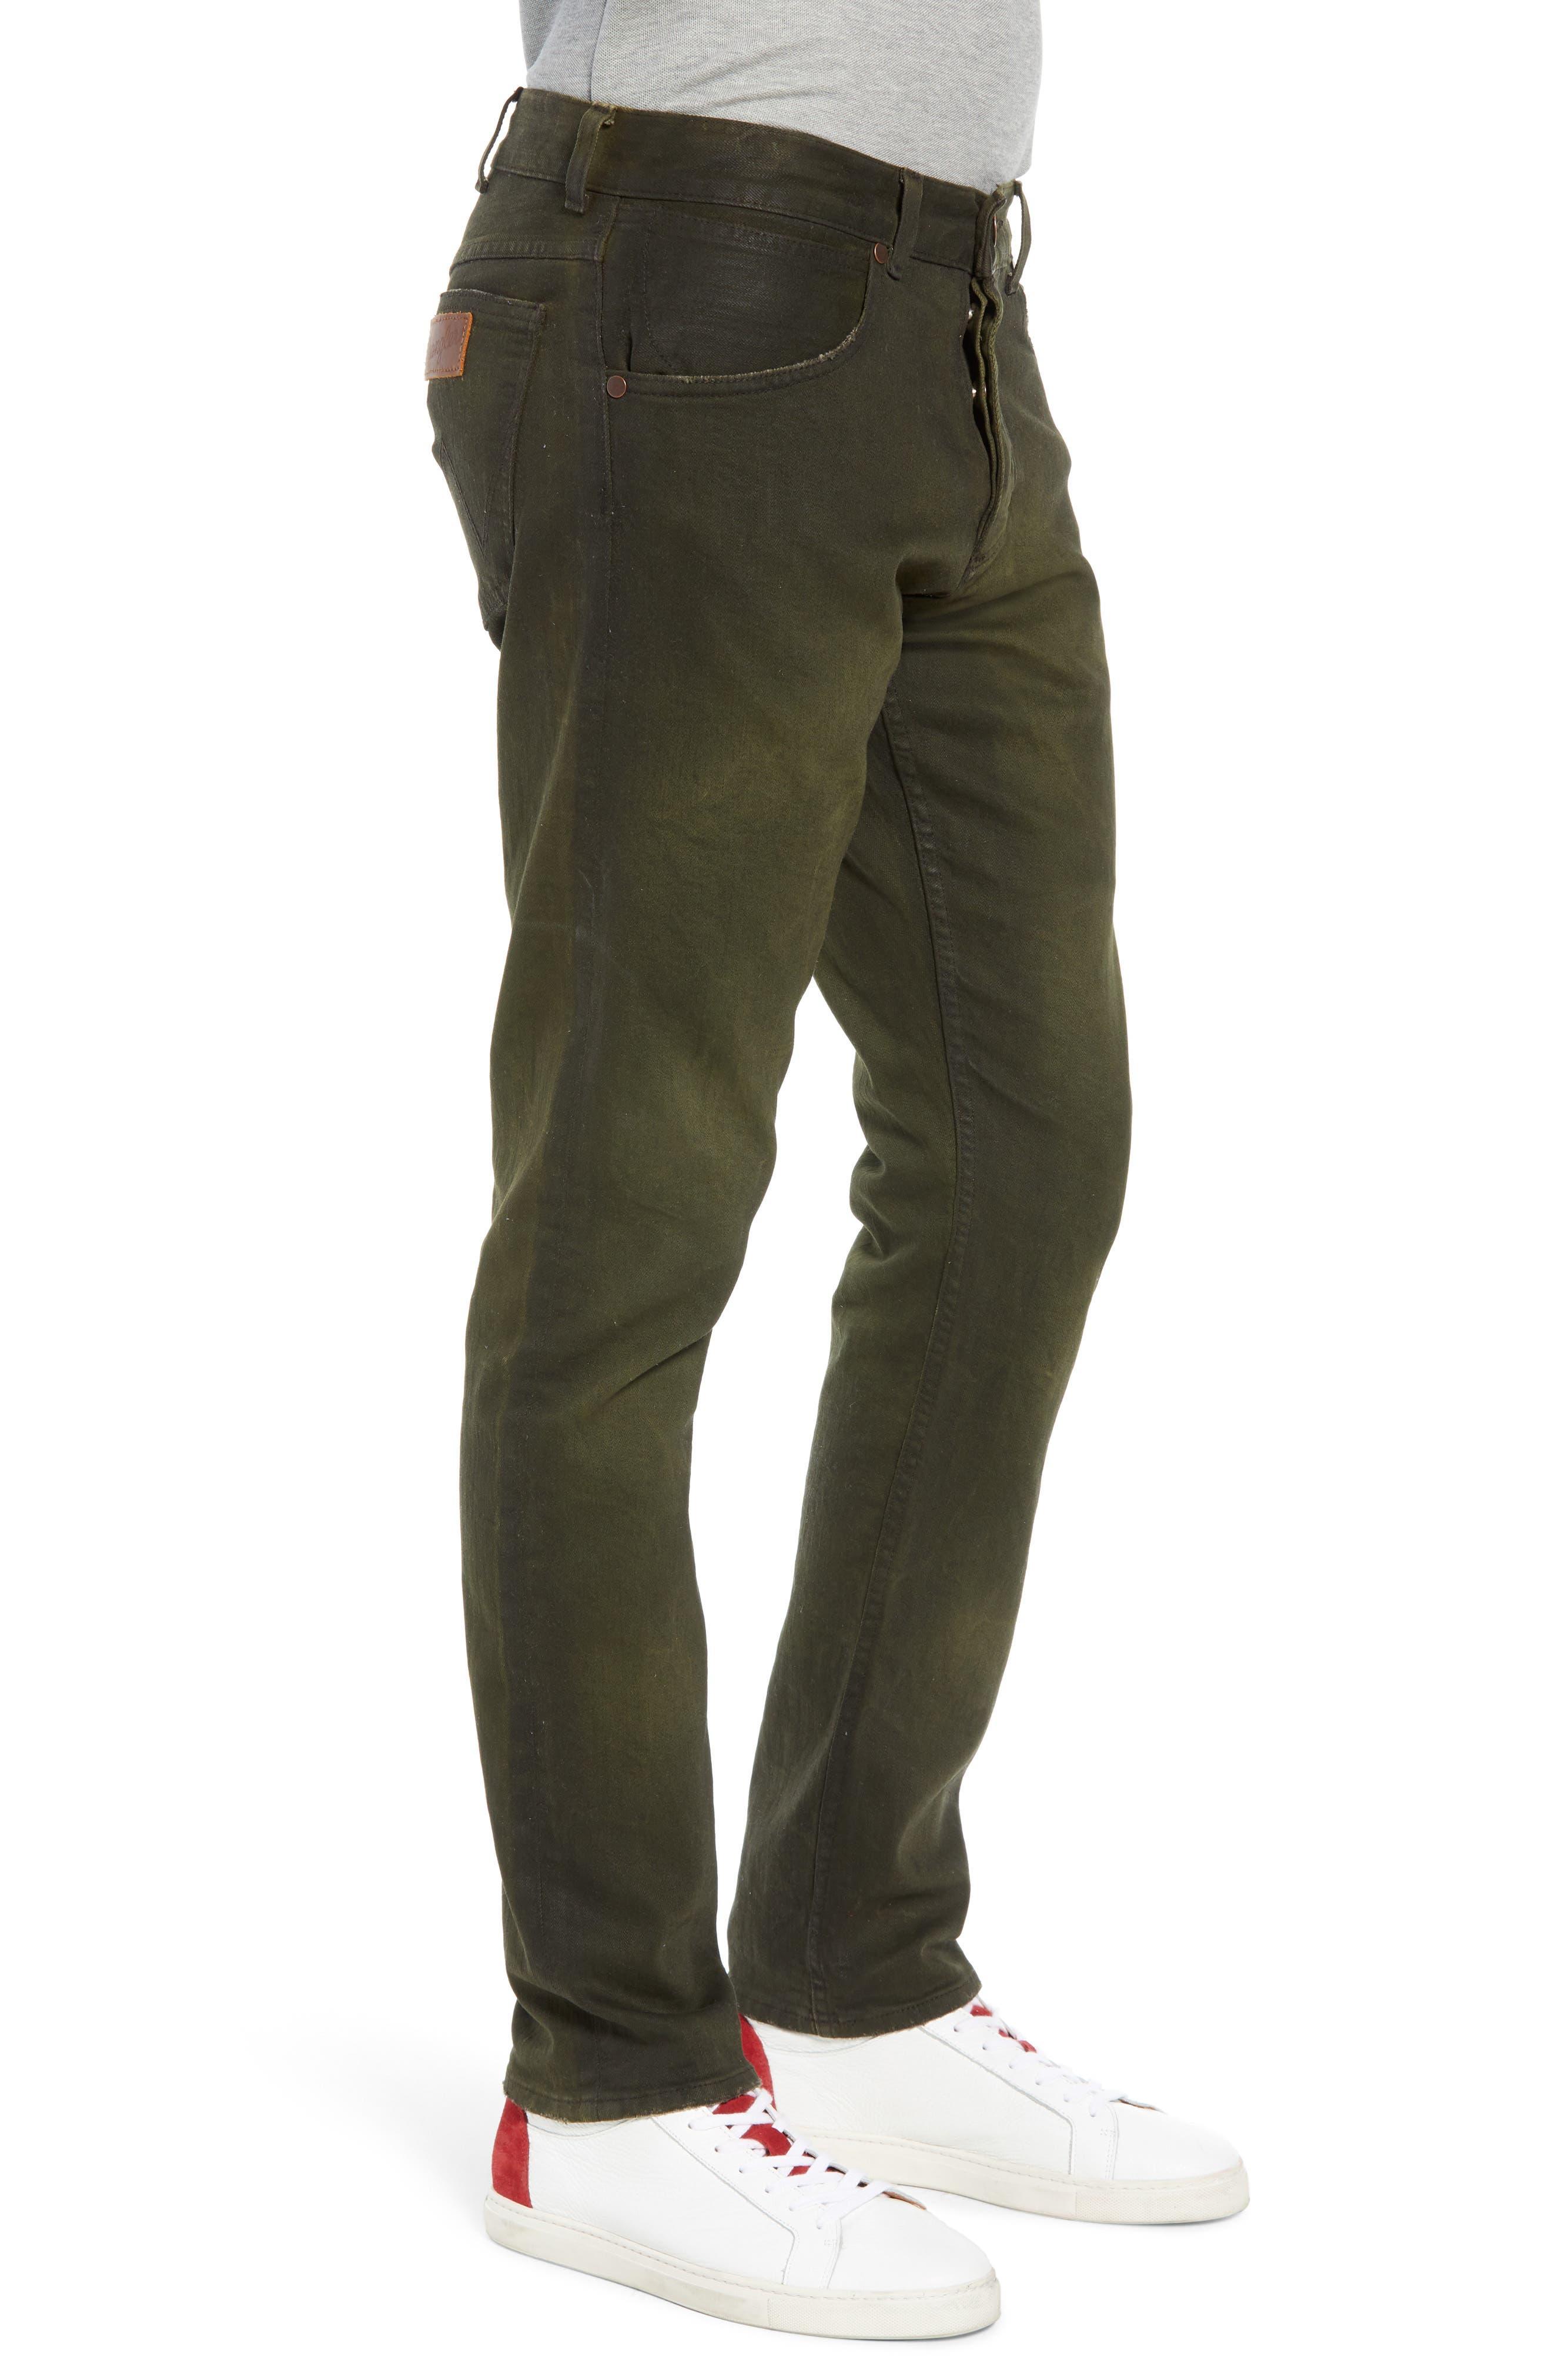 Larston Slim Fit Jeans,                             Alternate thumbnail 3, color,                             ROVER GREEN